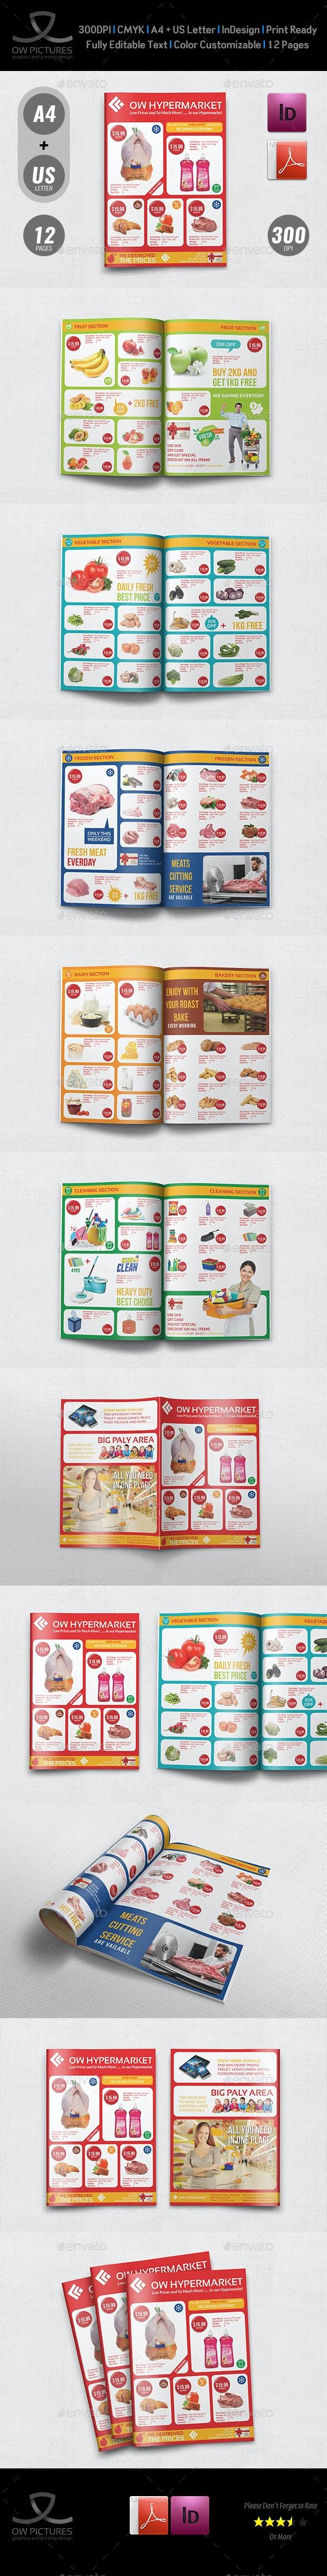 Supermarket Catalog Brochure Template Vol.4 - 12 Pages - Catalogs Brochures